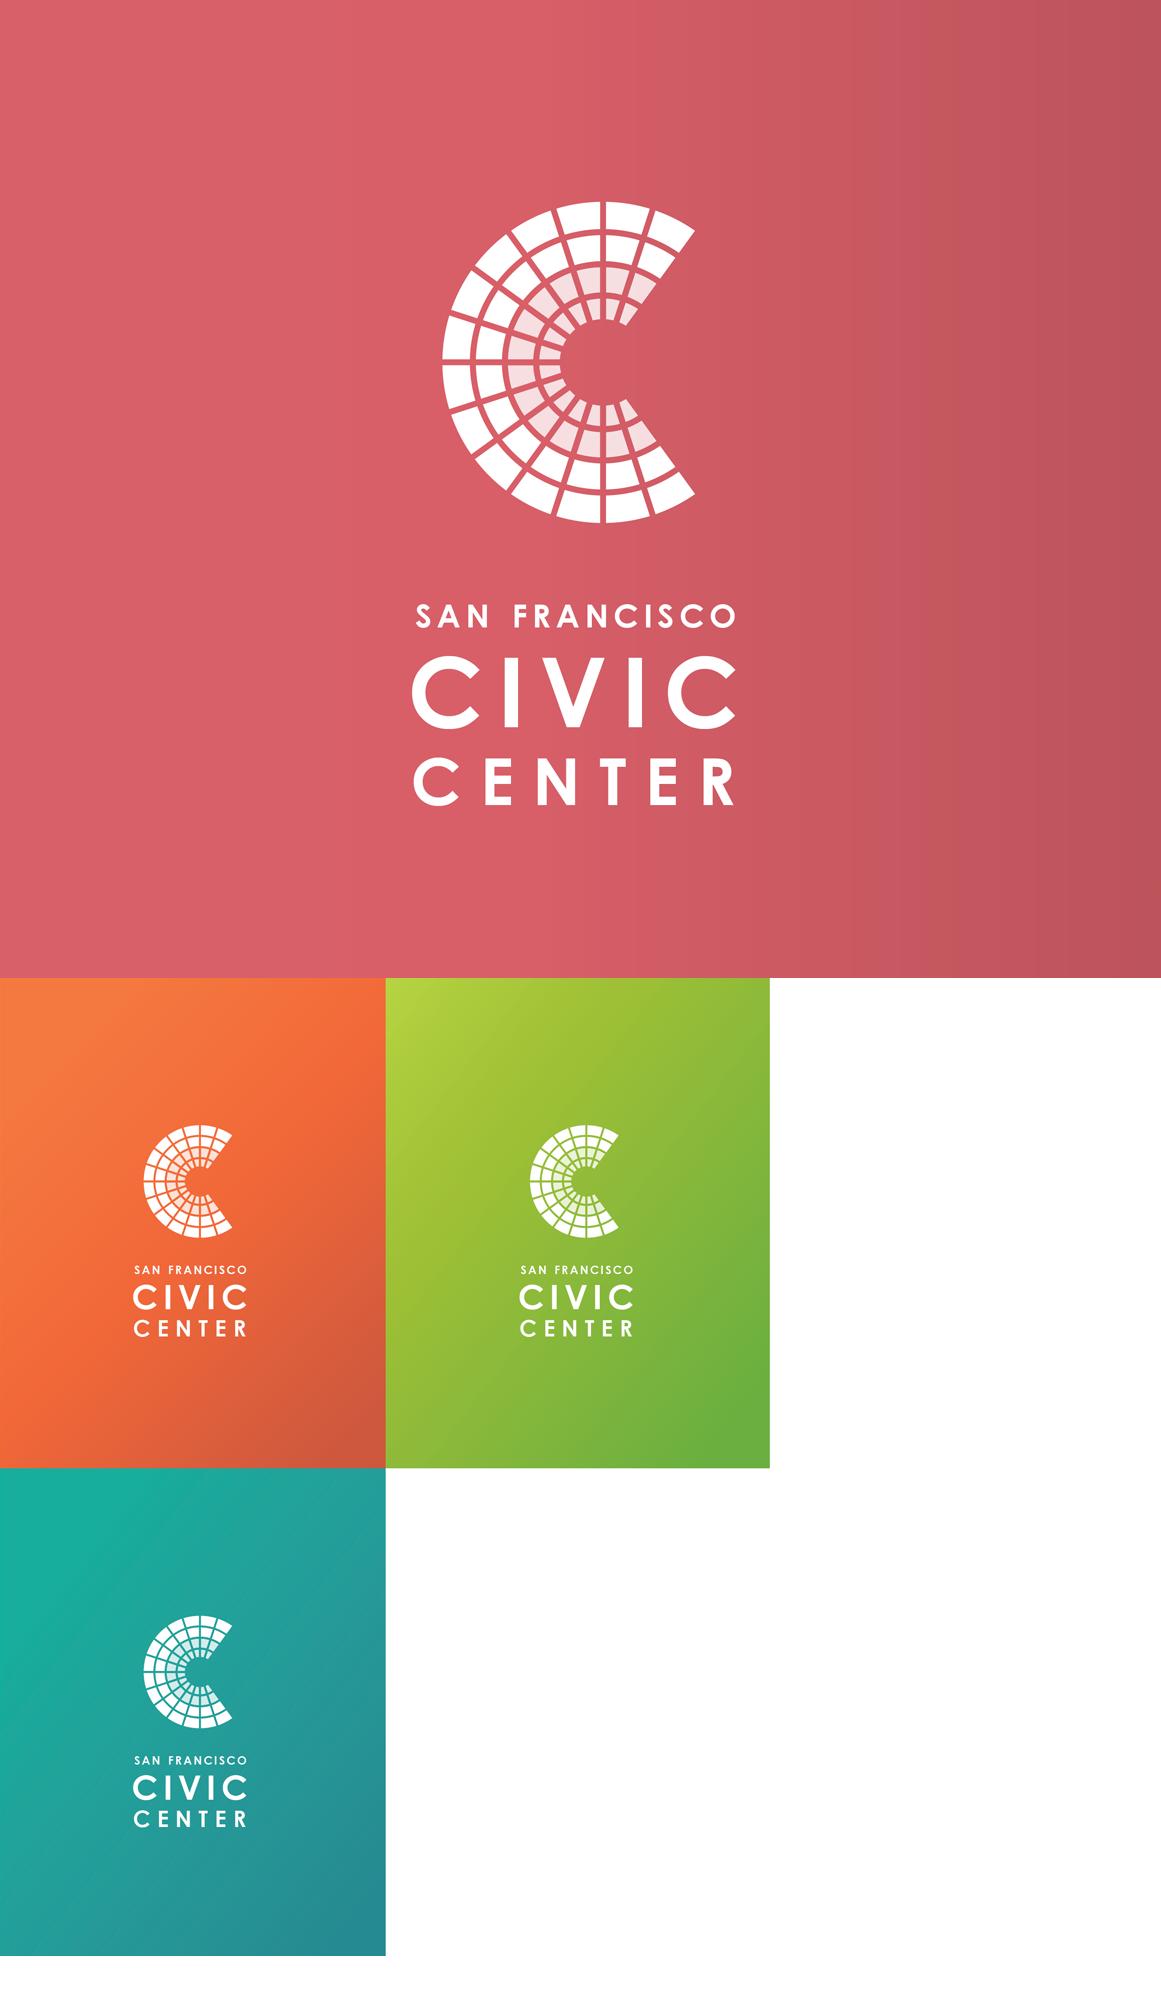 San Francisco Civic Center collection of white logos on color blocks